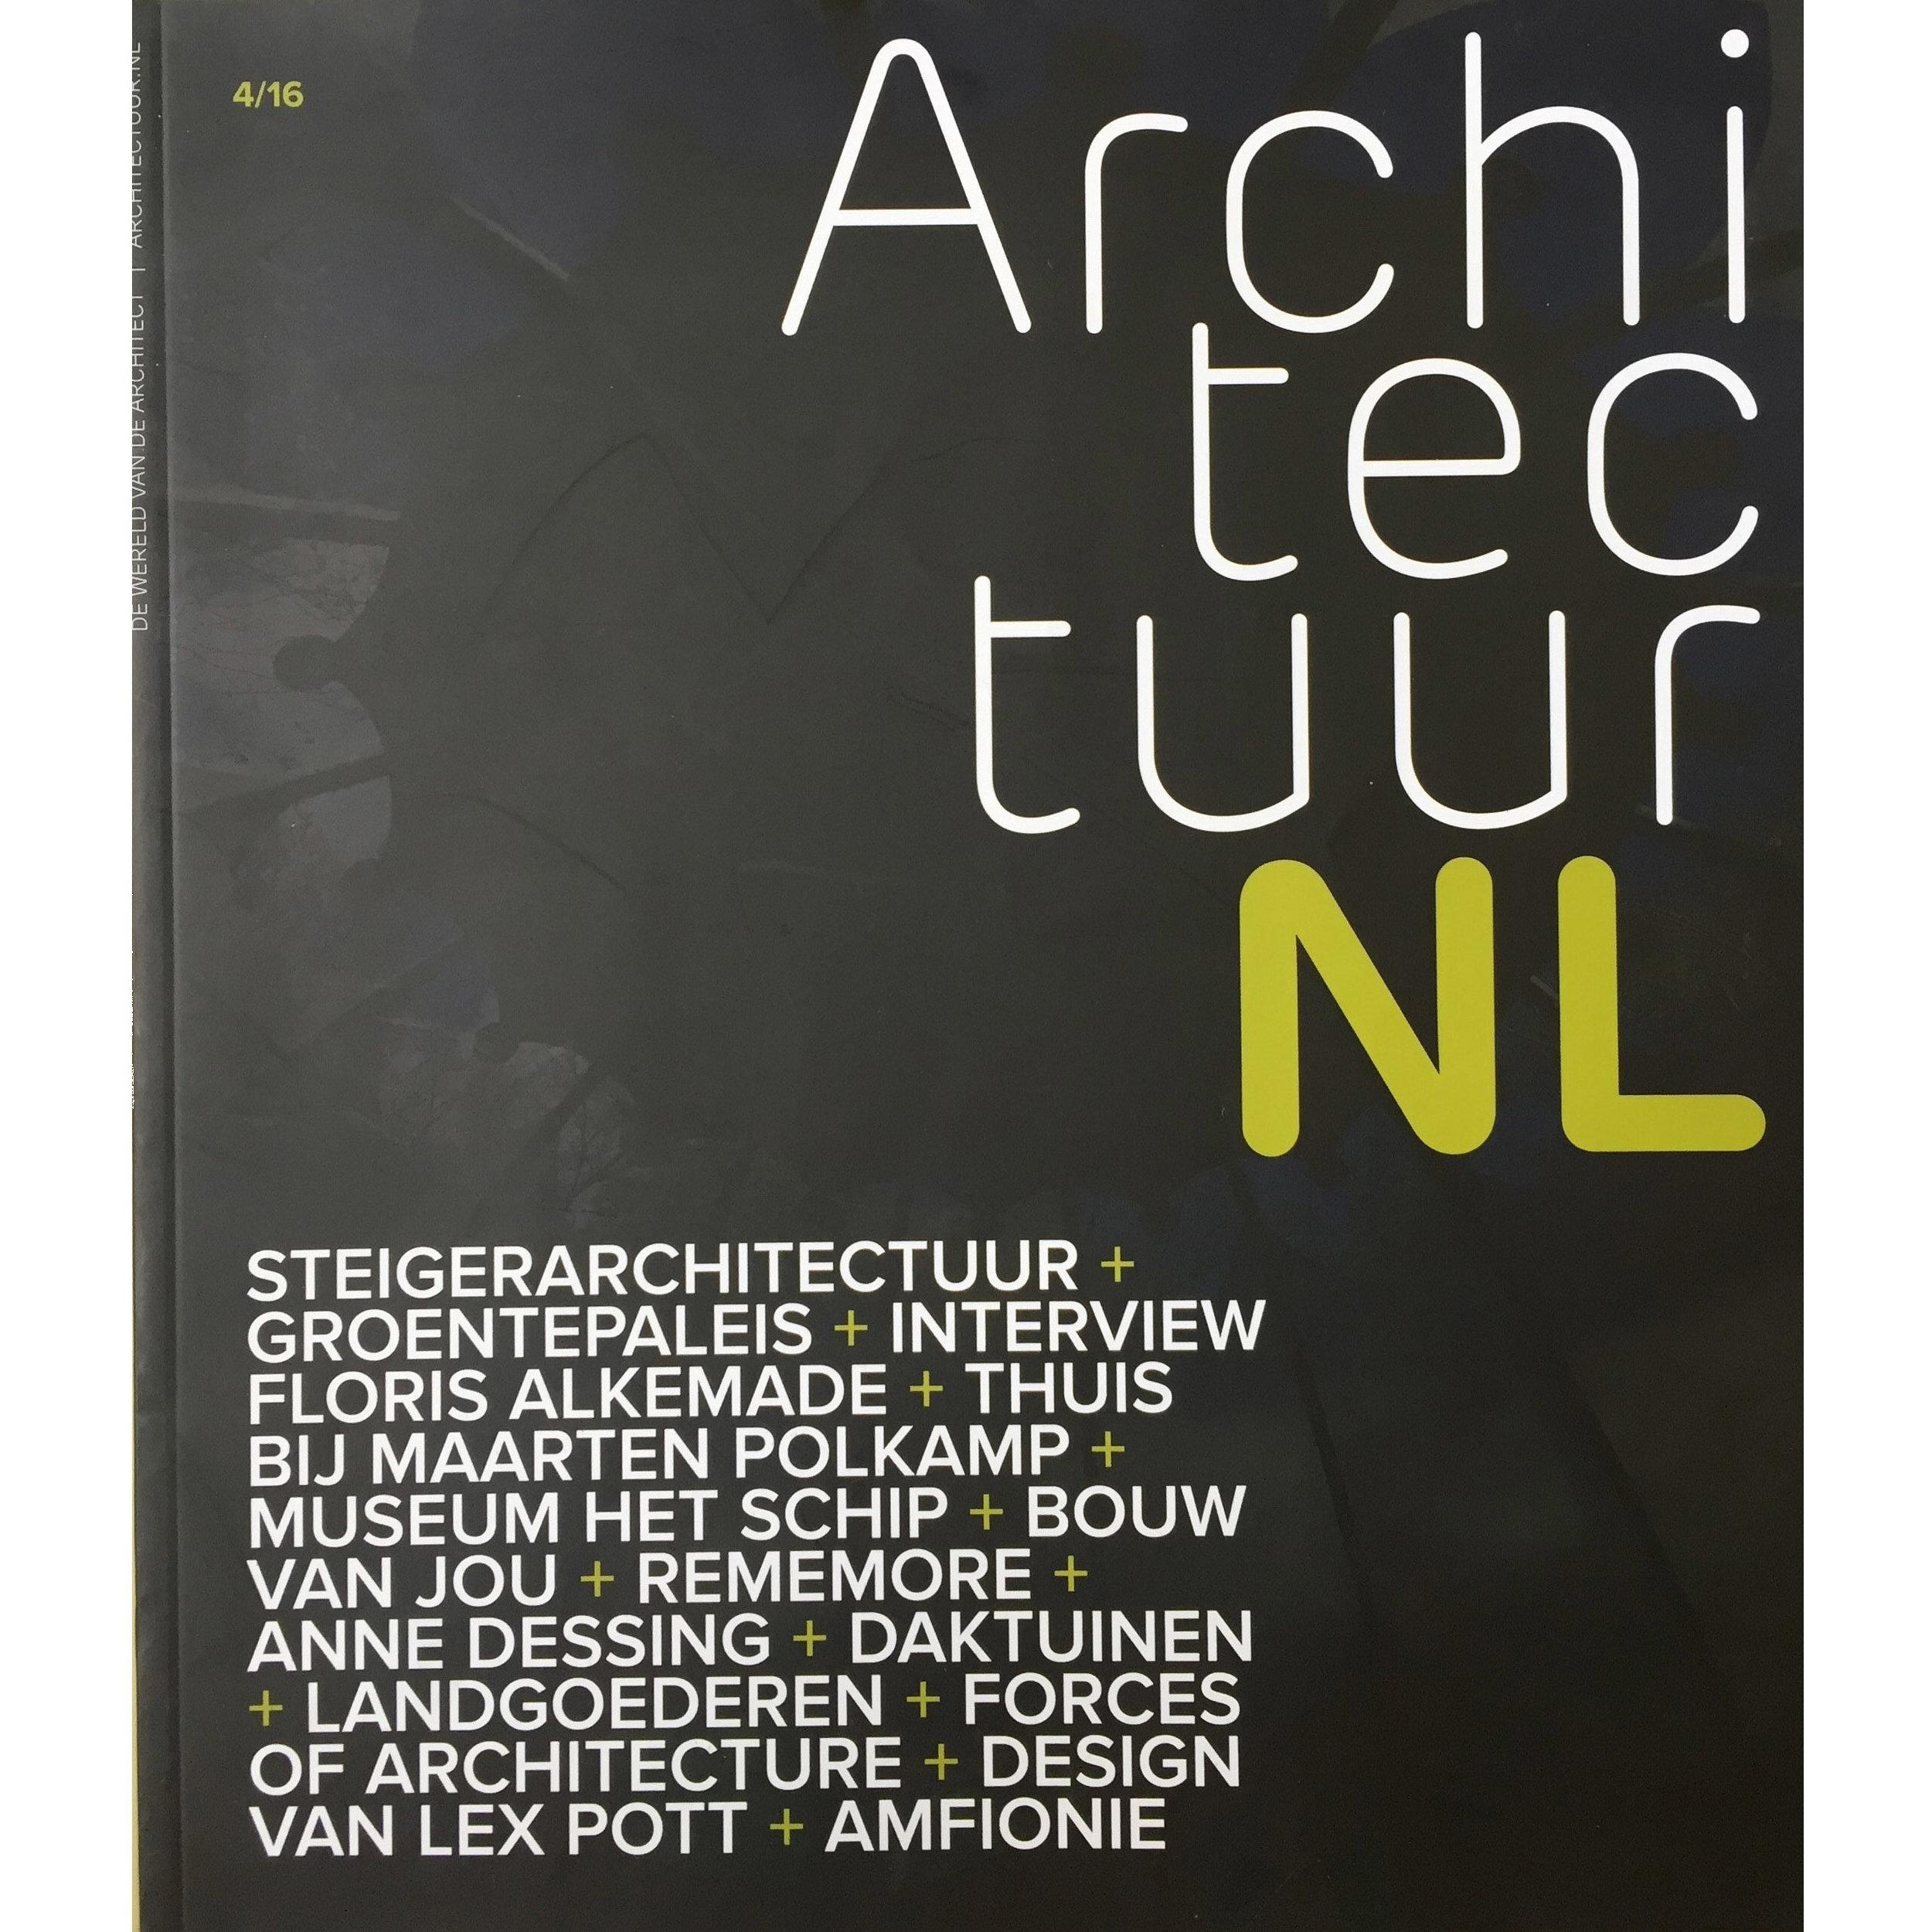 Architectuur NL.jpg